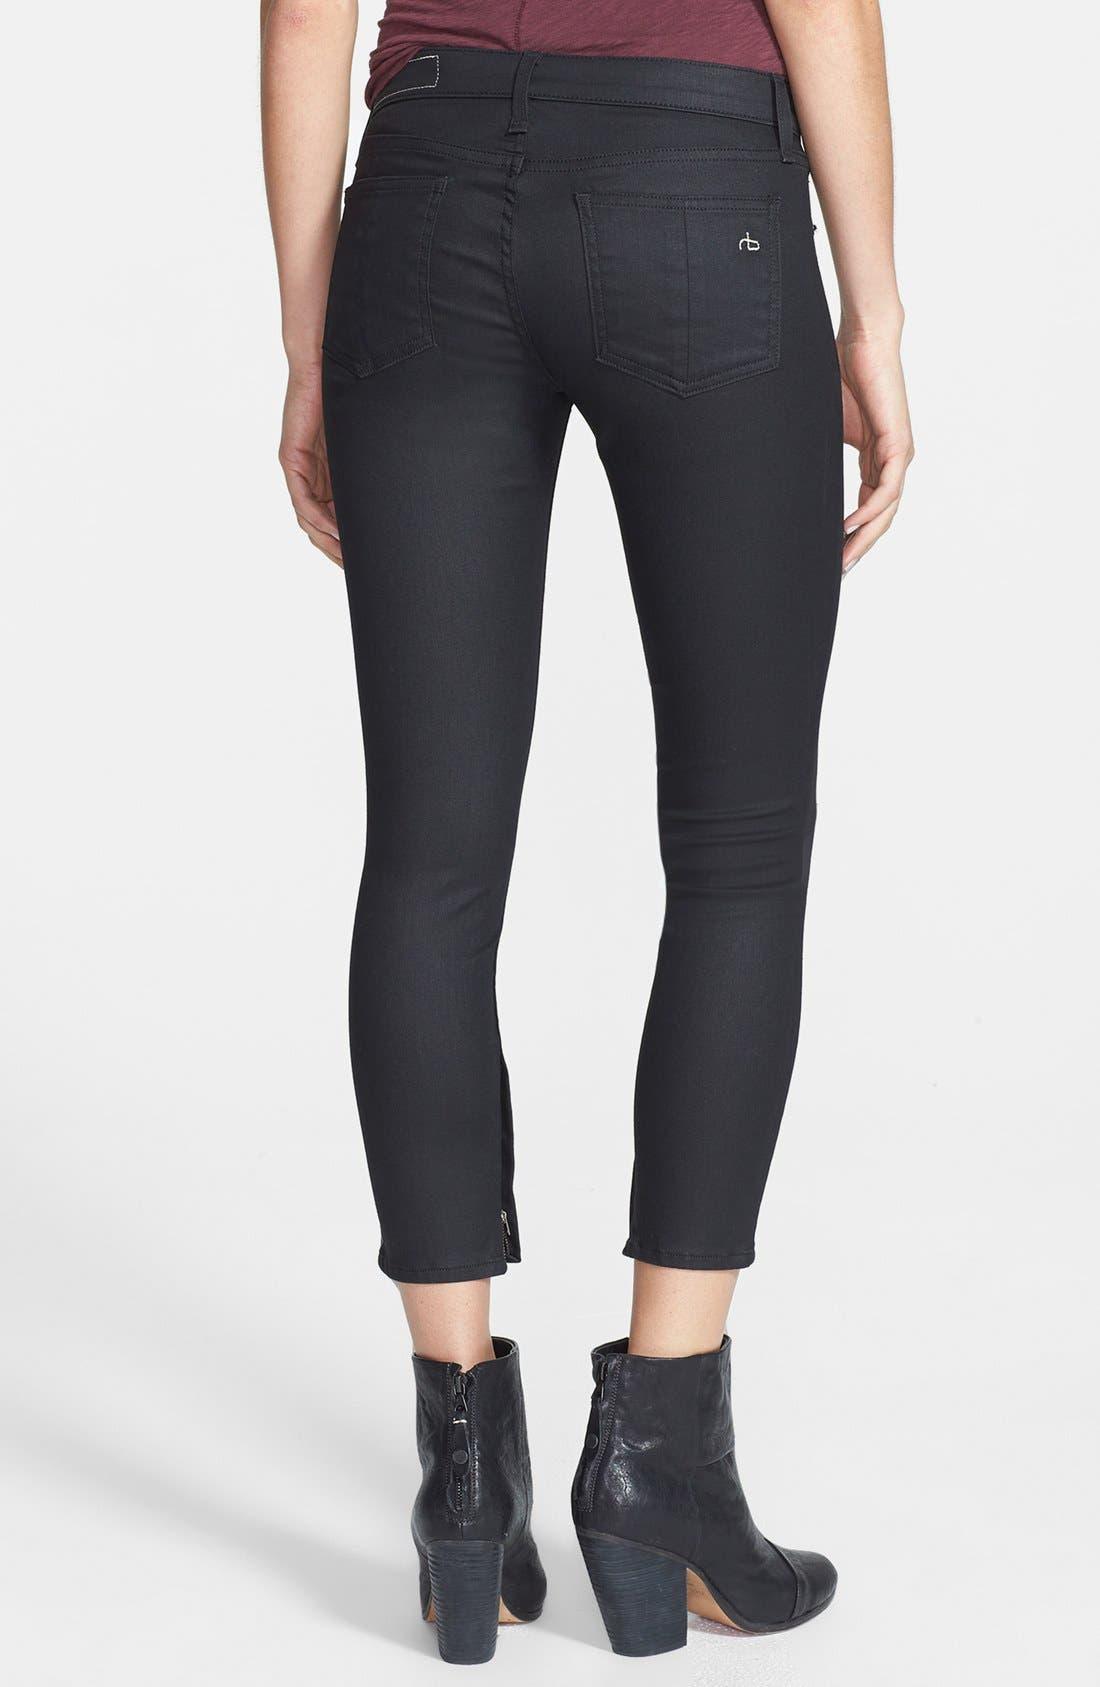 Alternate Image 2  - rag & bone/JEAN Coated Zip Cuff Crop Jeans (Cotswald)